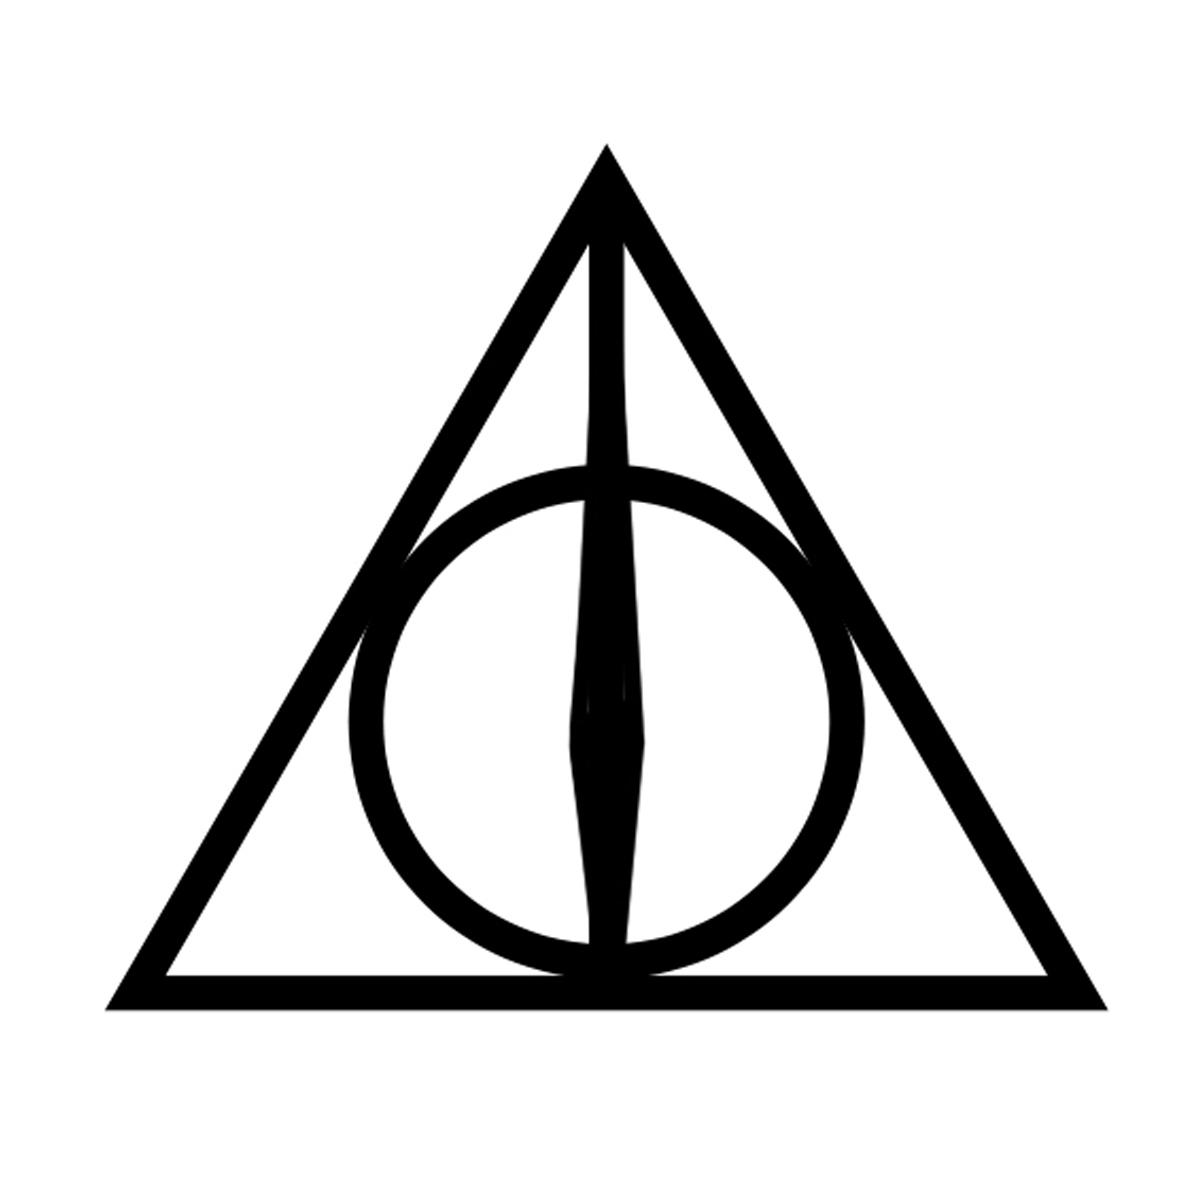 Latex complete symbol set triangle